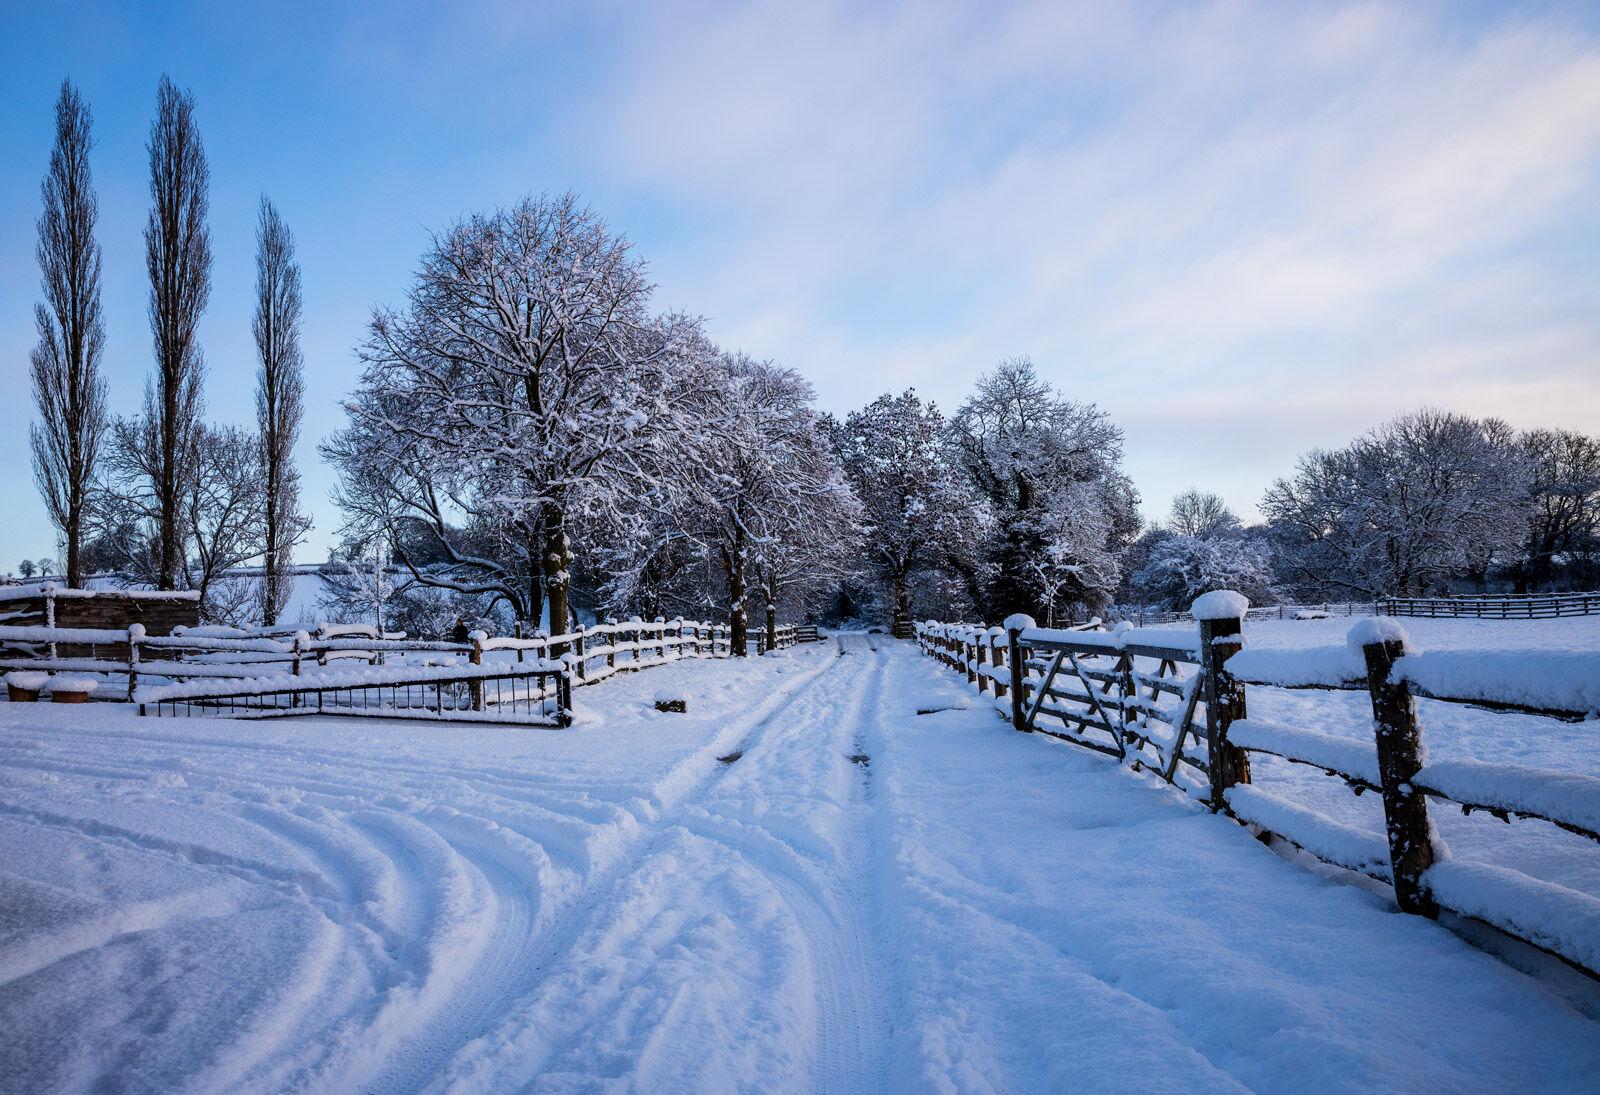 Snowy Medows